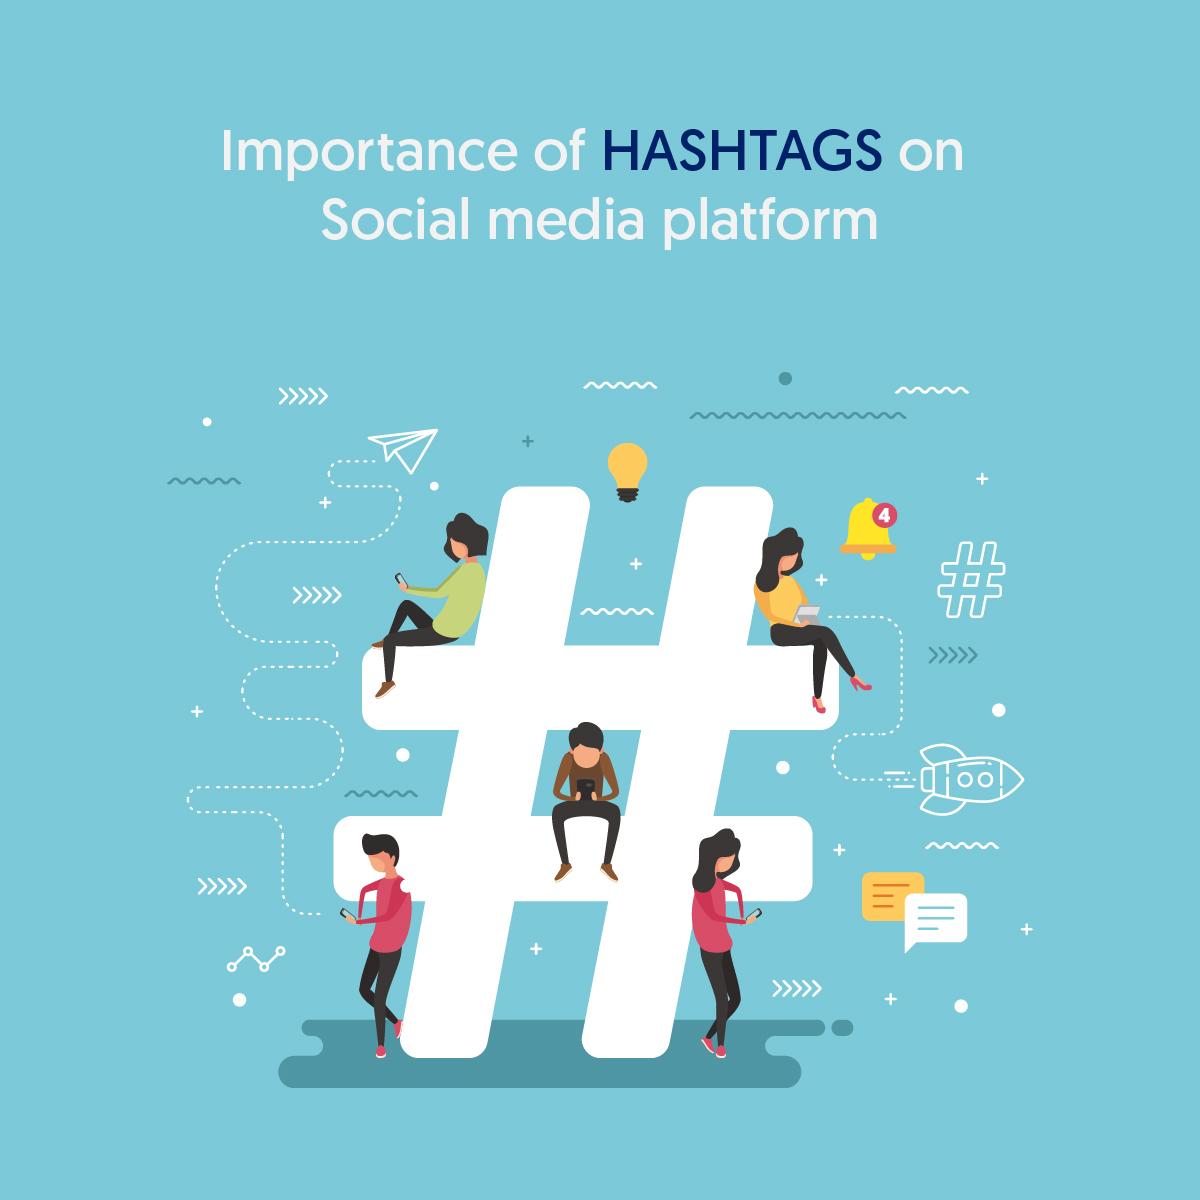 Importance of Hashtags (#) on Social media platform